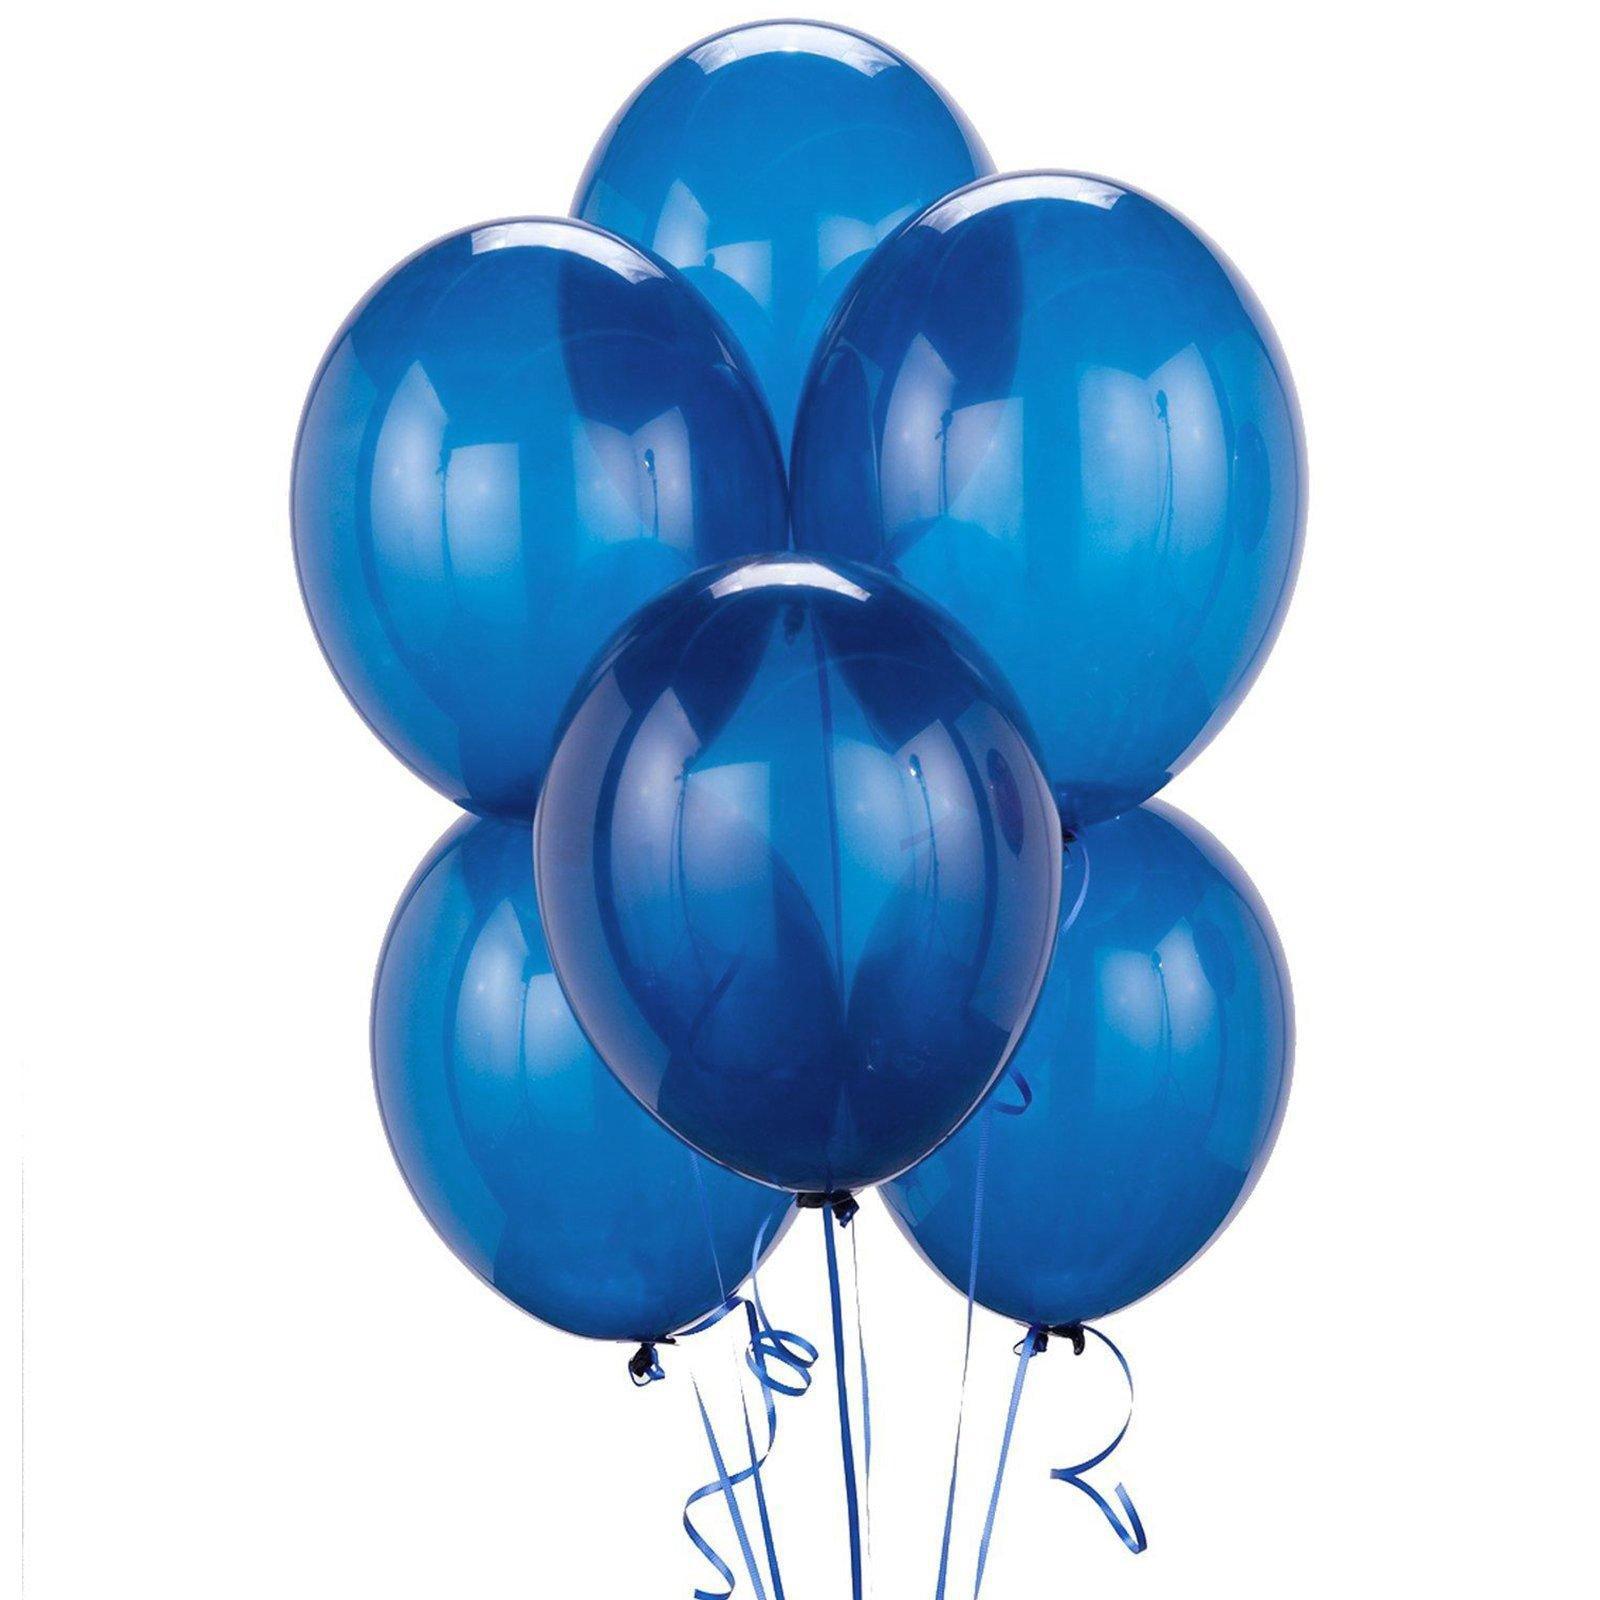 "Pioneer Balloon Solid 11"" Round Latex Balloons, Midnight Blue, Bulk 100 Pack"